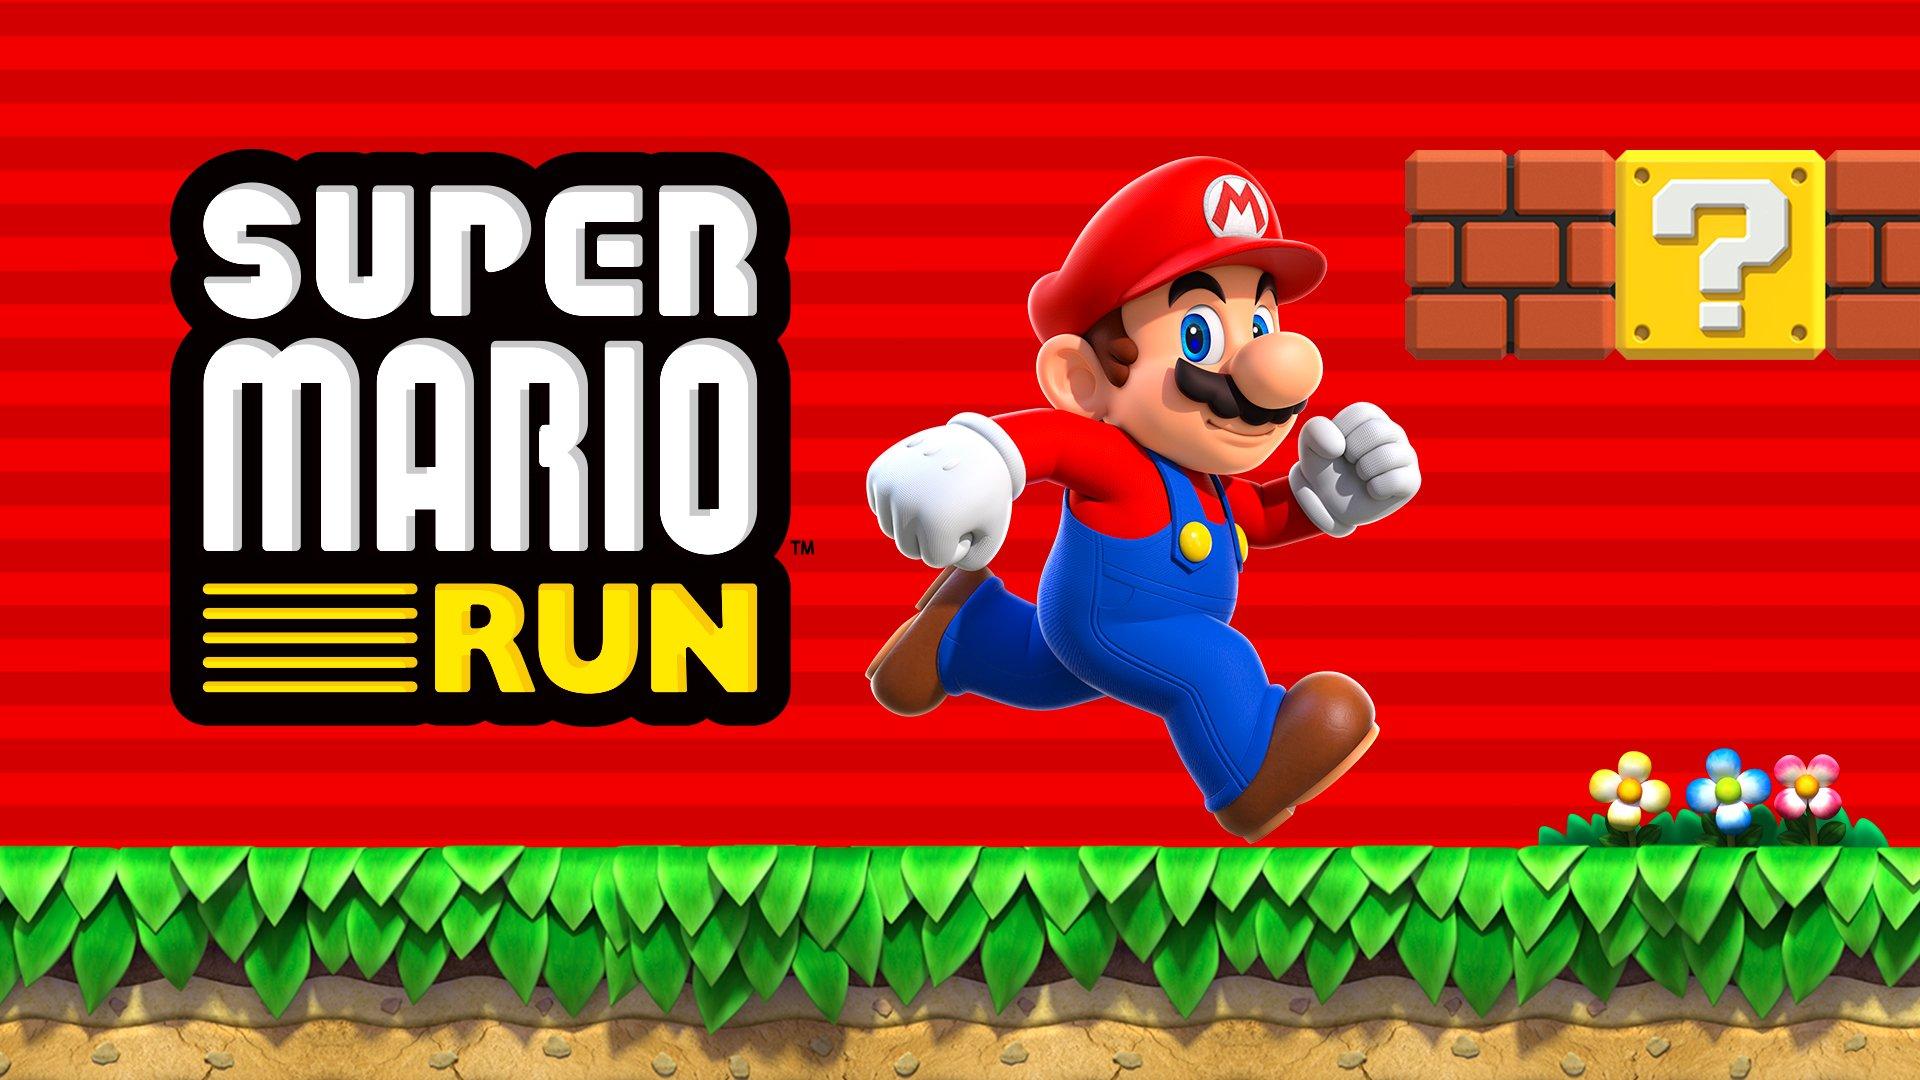 Jimmy Fallon Debuts the Nintendo Switch - Super Mario is Back